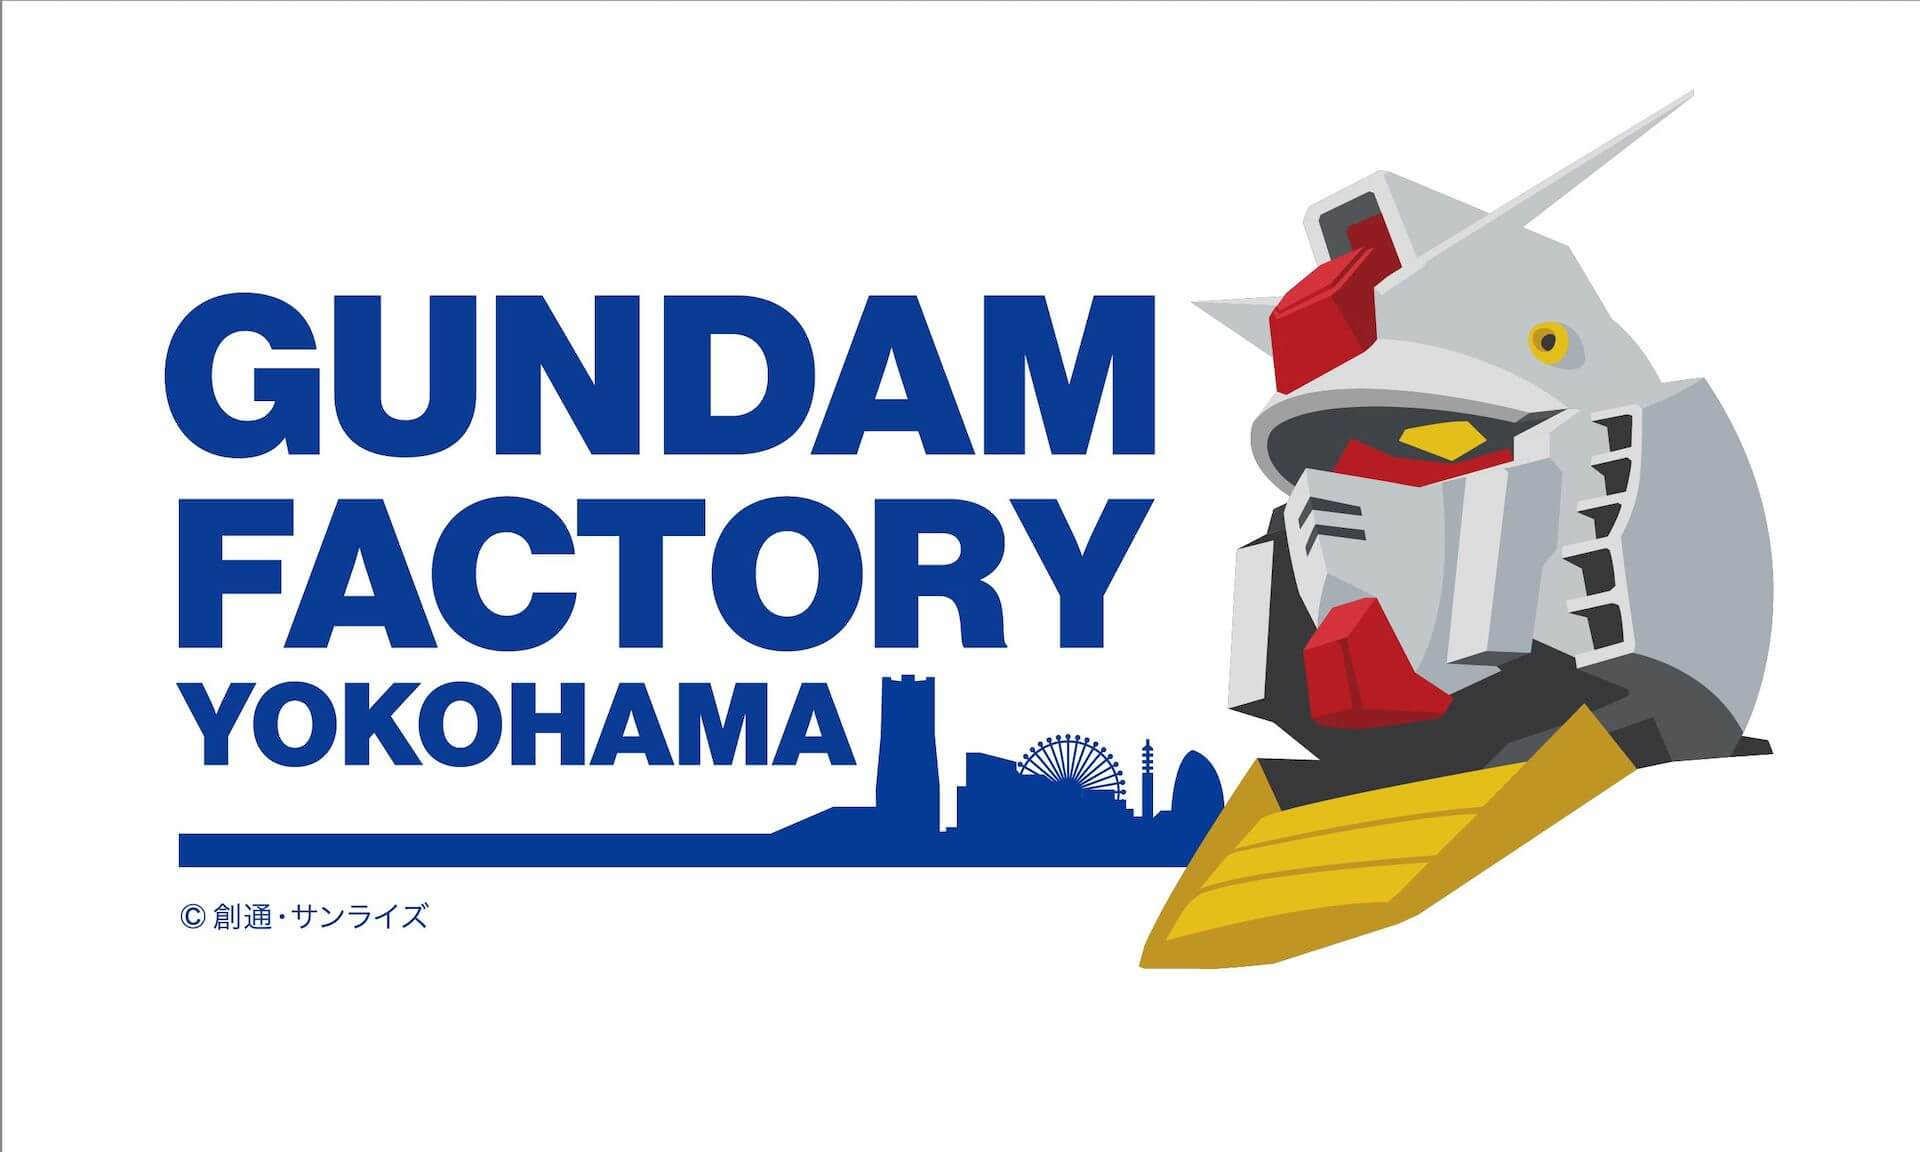 18mの動く実物大ガンダムが横浜に!「GUNDAM FACTORY YOKOHAMA」10月オープン art200120_gundam_7